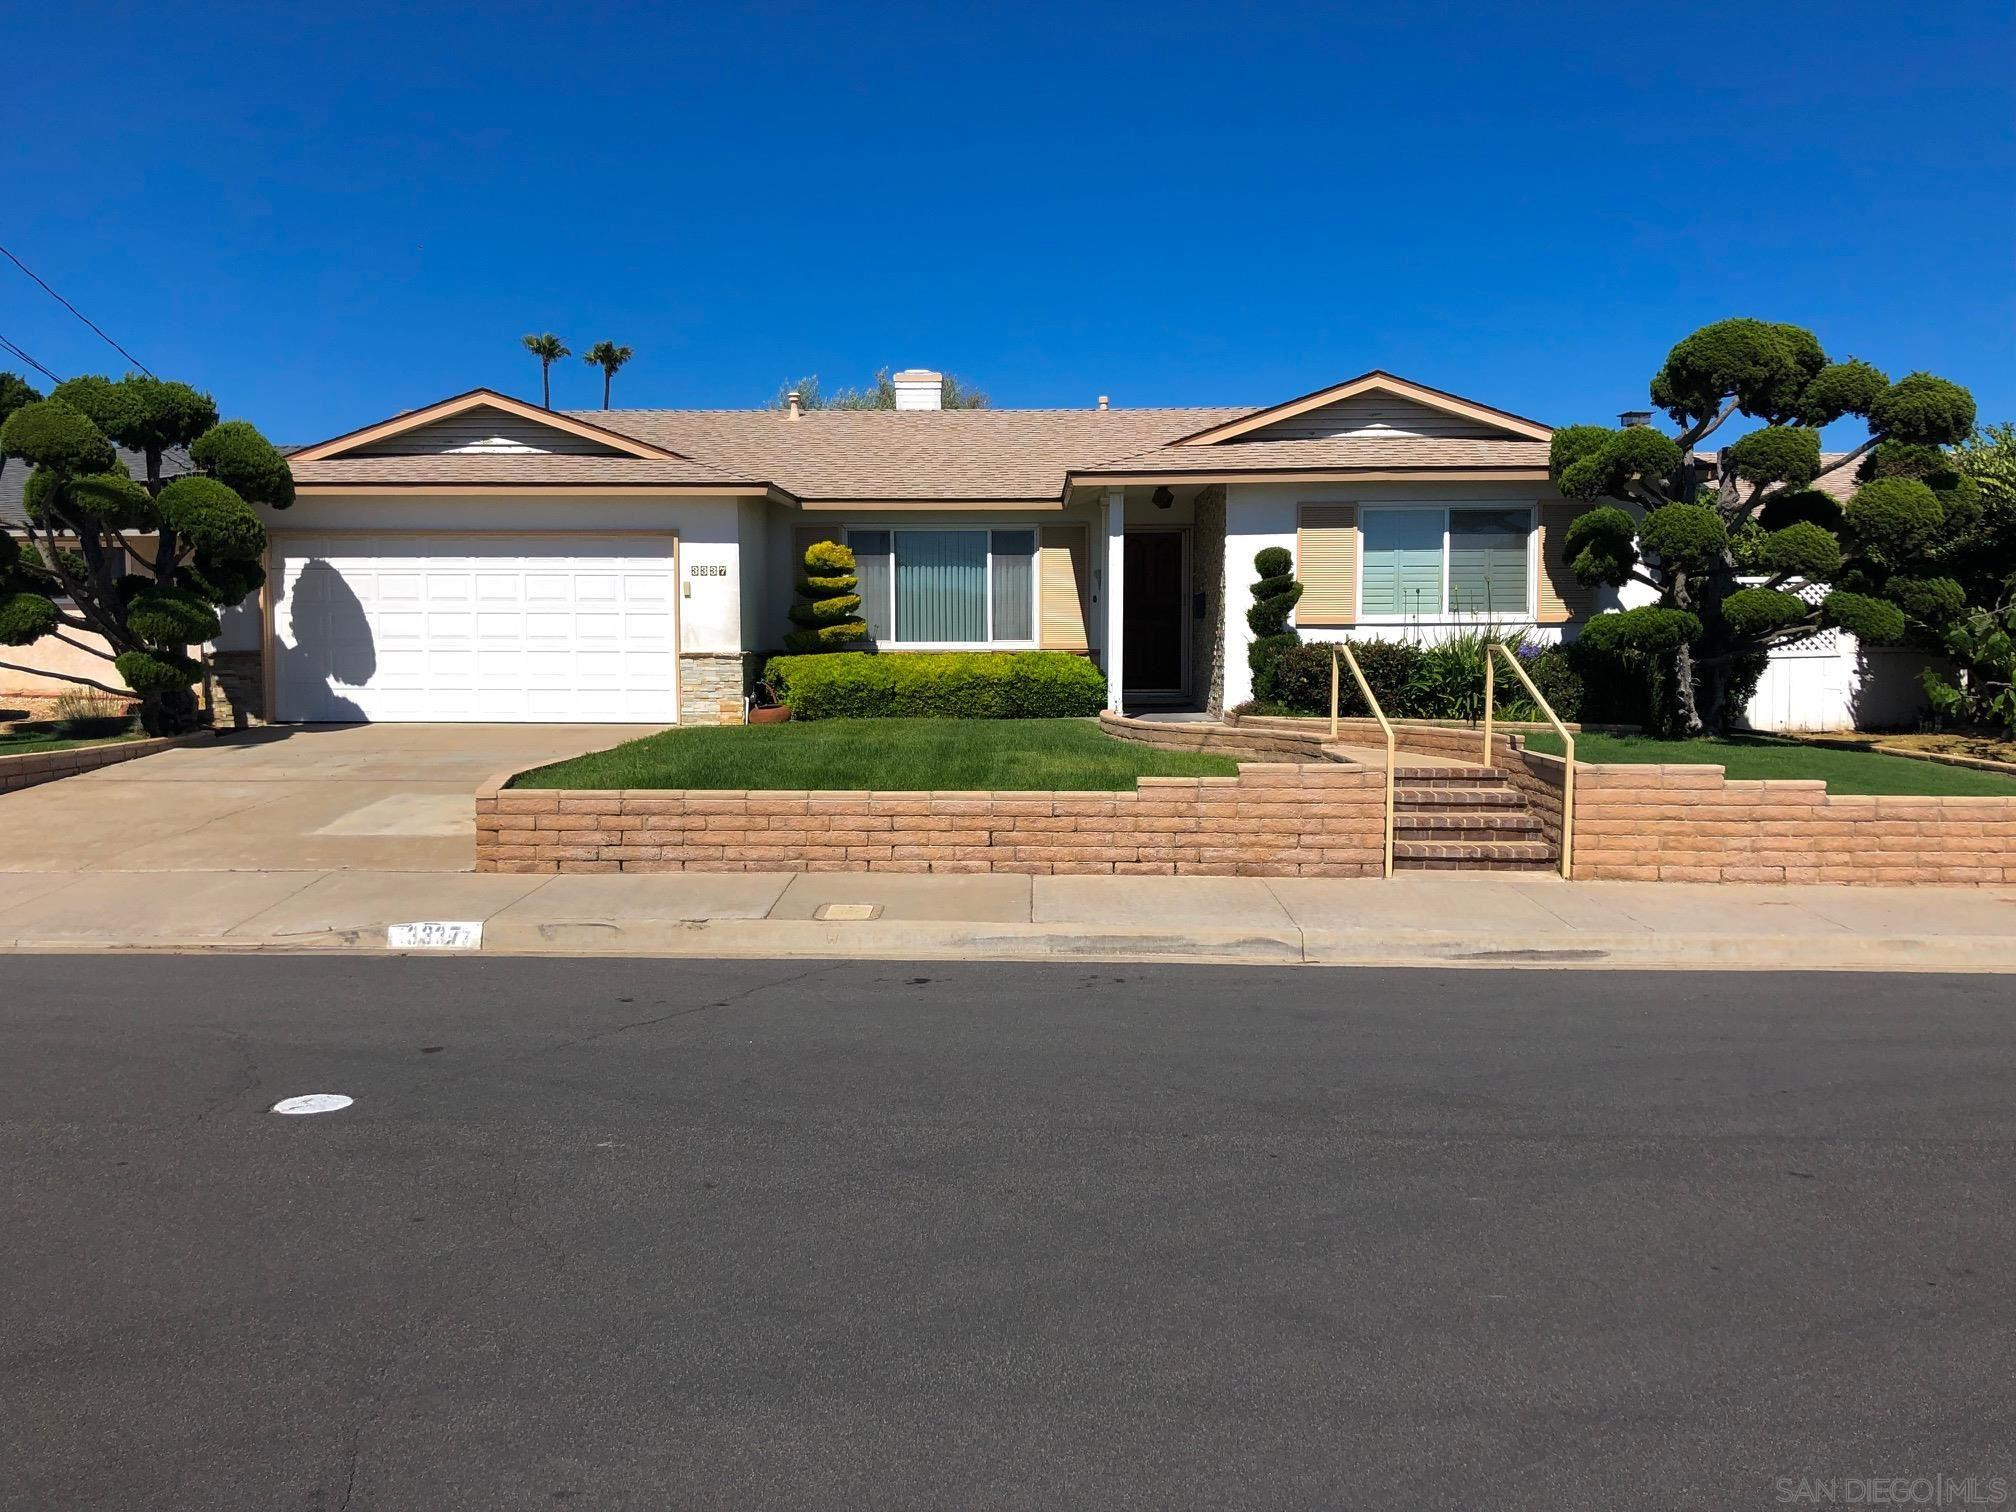 3337 Mount Aachen Ave., San Diego, CA 92111